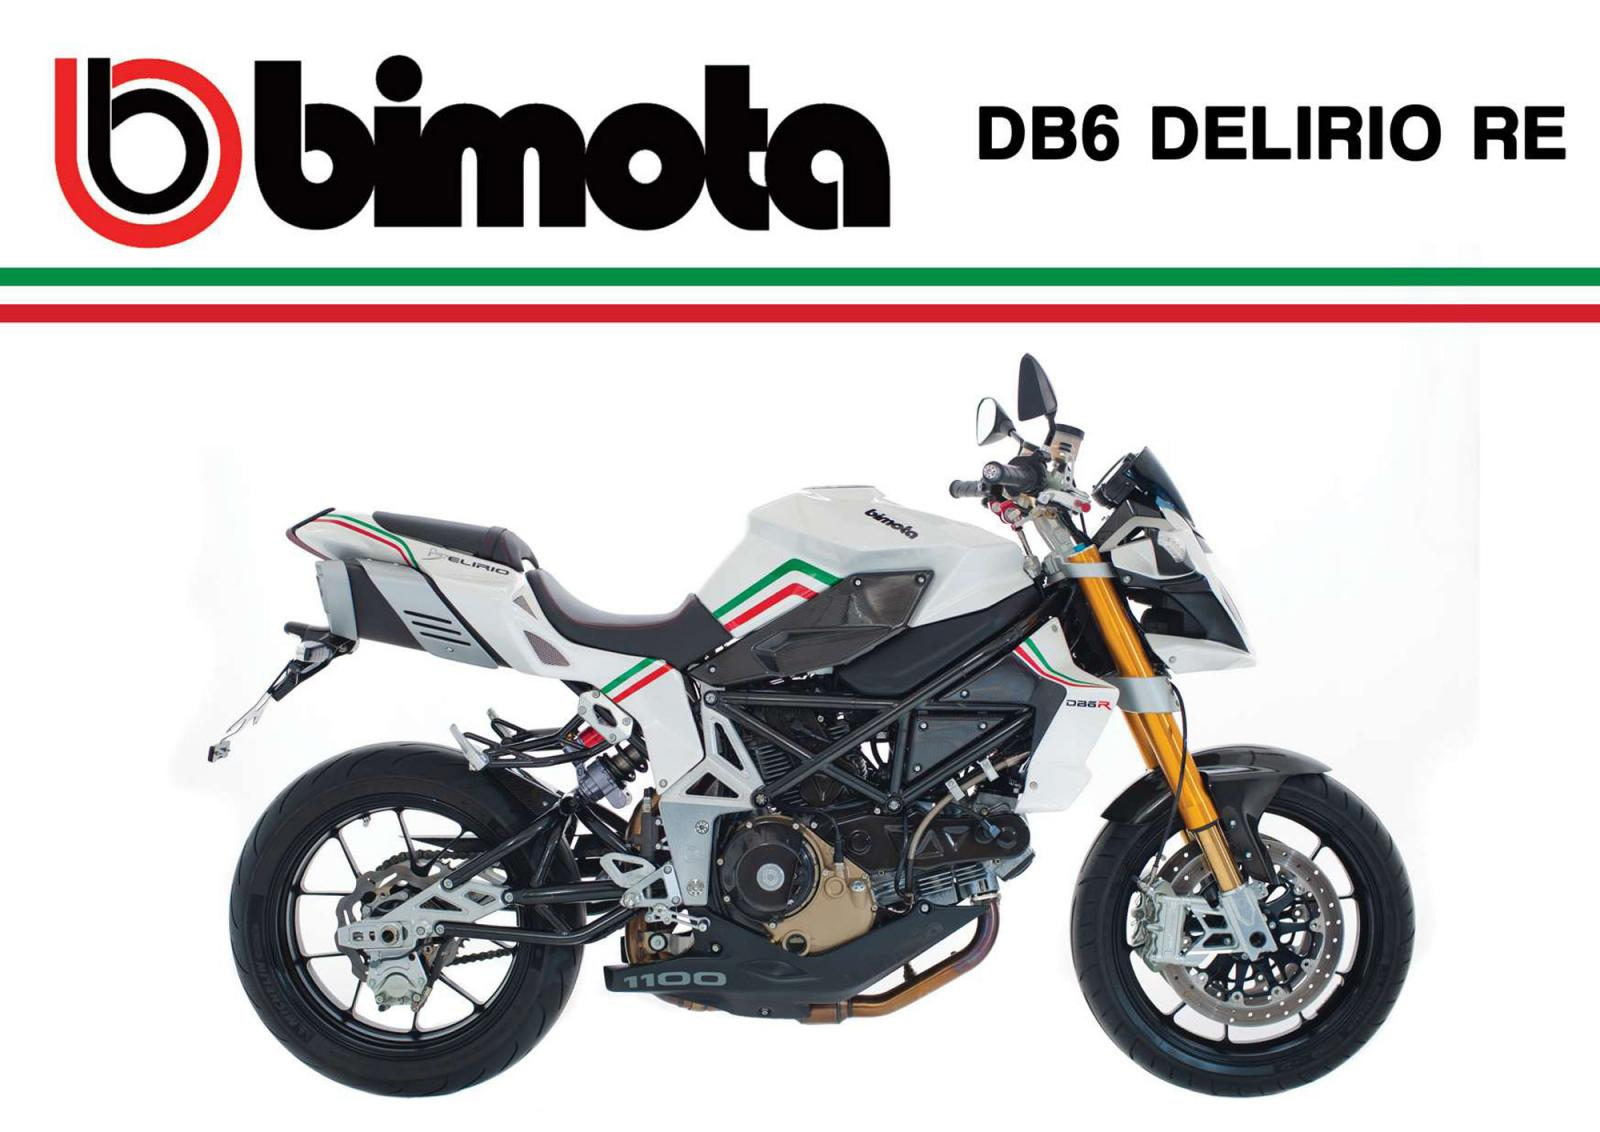 Bimota DB6 Delirio Azzurro